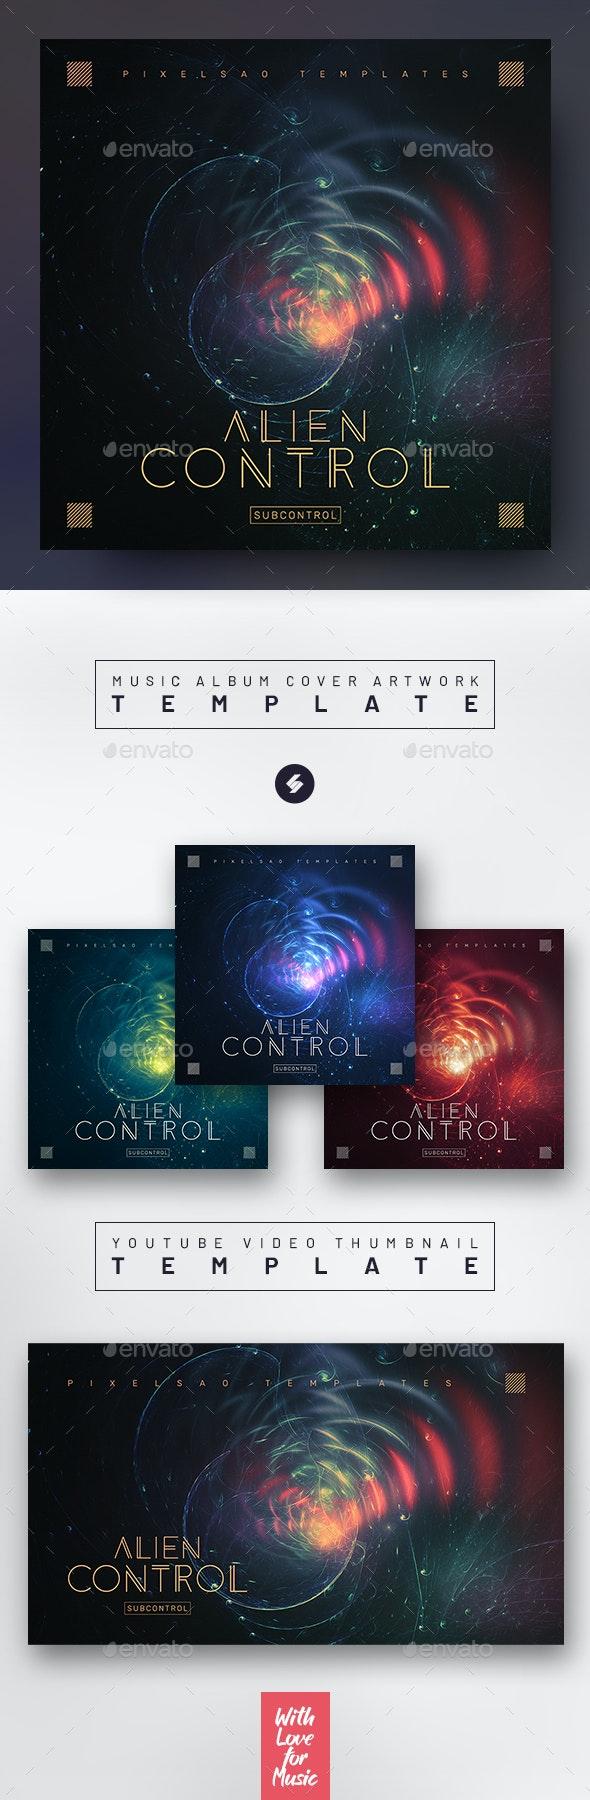 Alien Control – Music Album Cover Artwork / Youtube Thumbnail Template - Miscellaneous Social Media